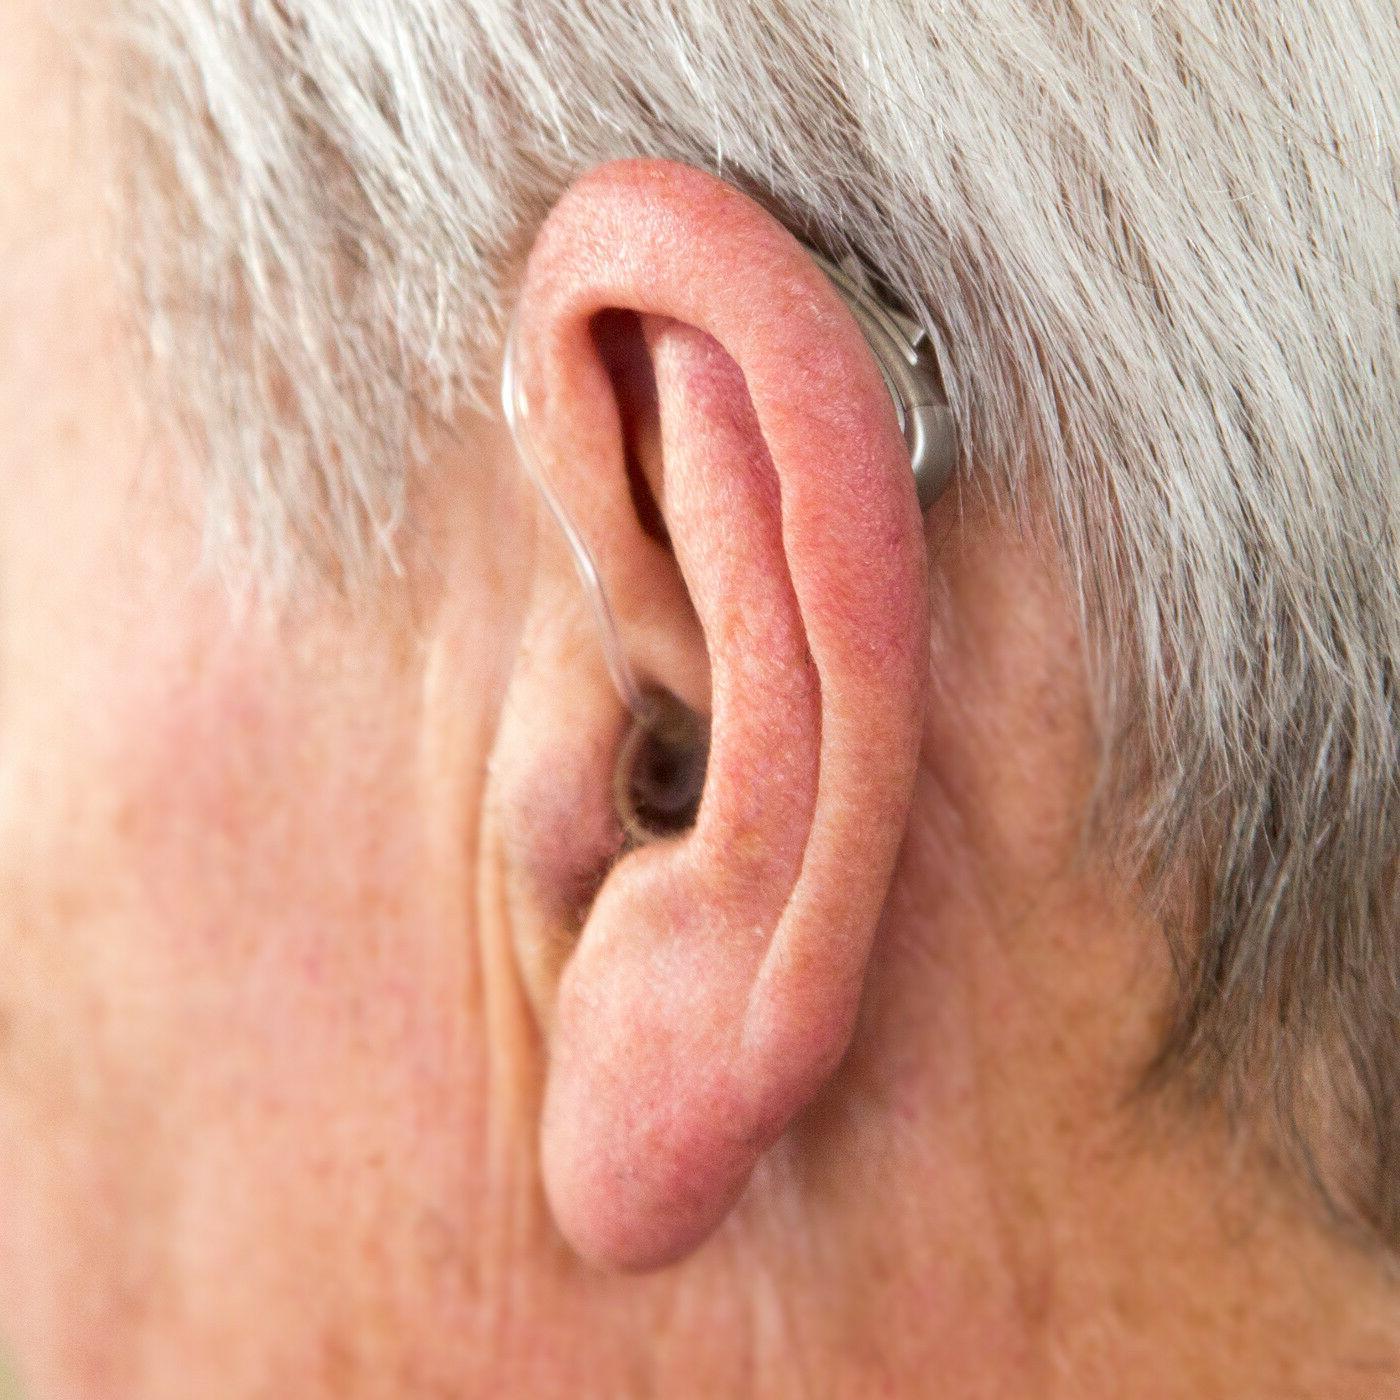 Otofonix Hearing